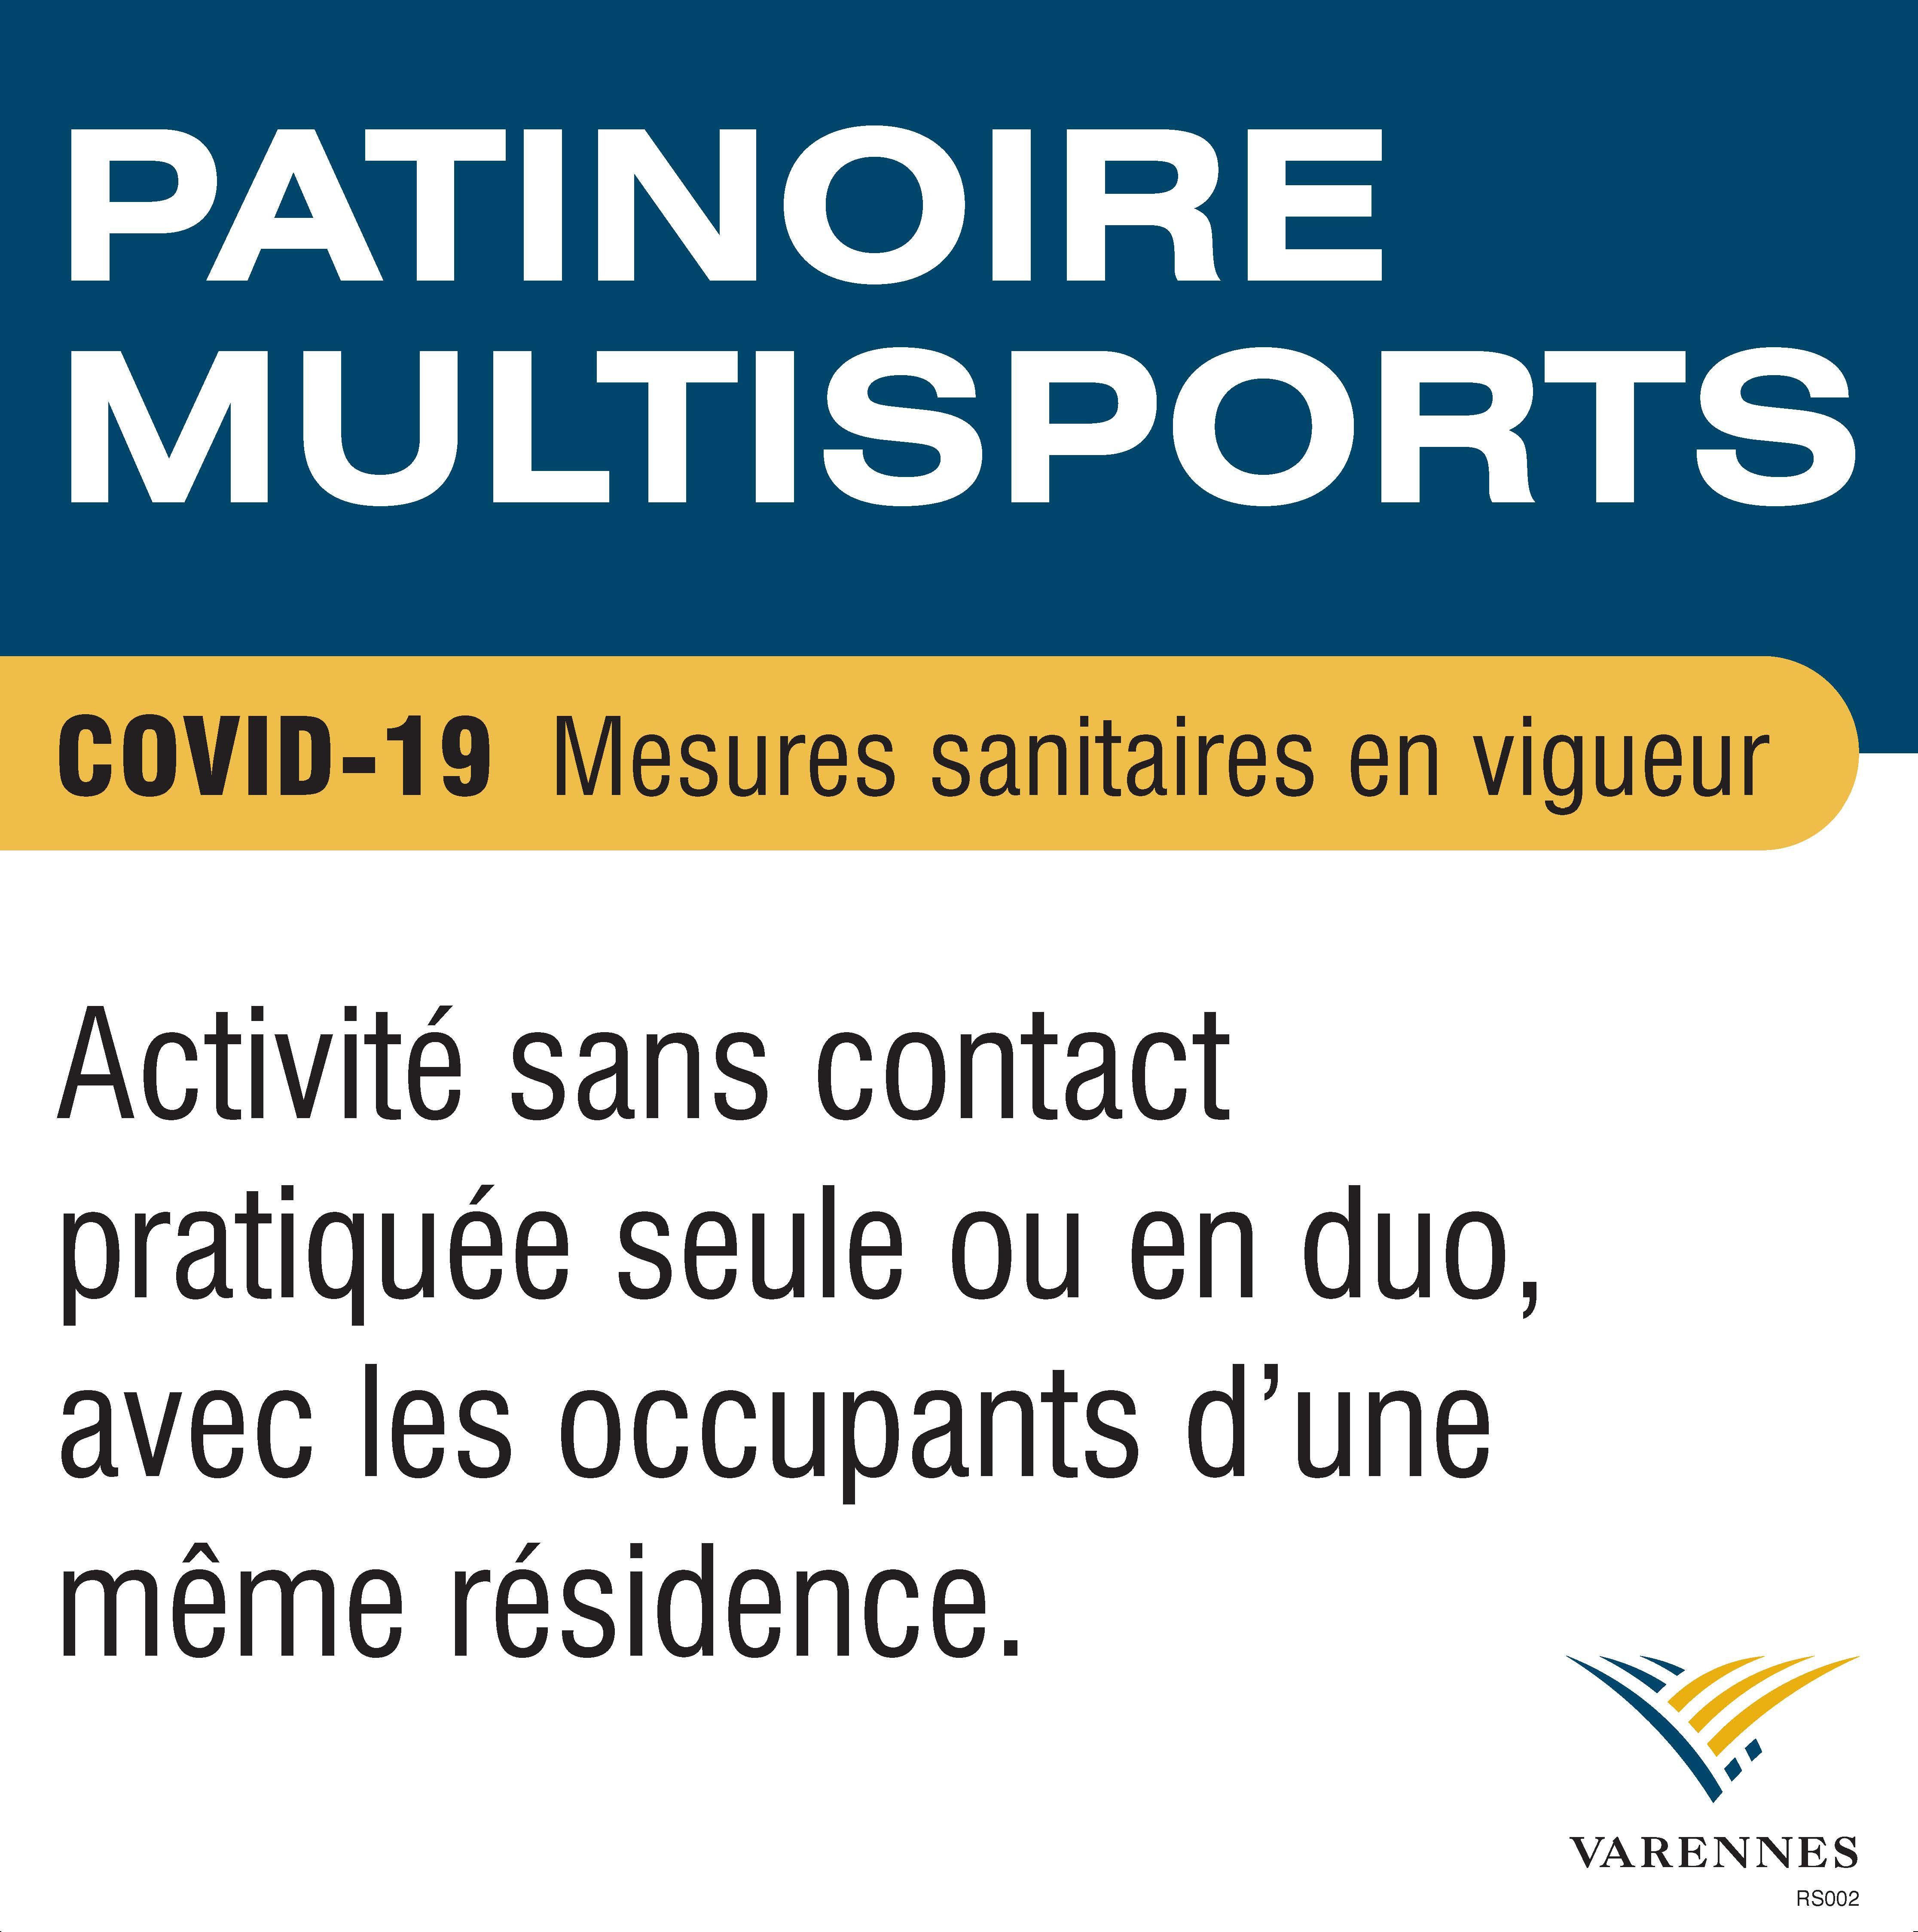 2021-04-21_-_Patinoire_multisports.jpg (664 KB)